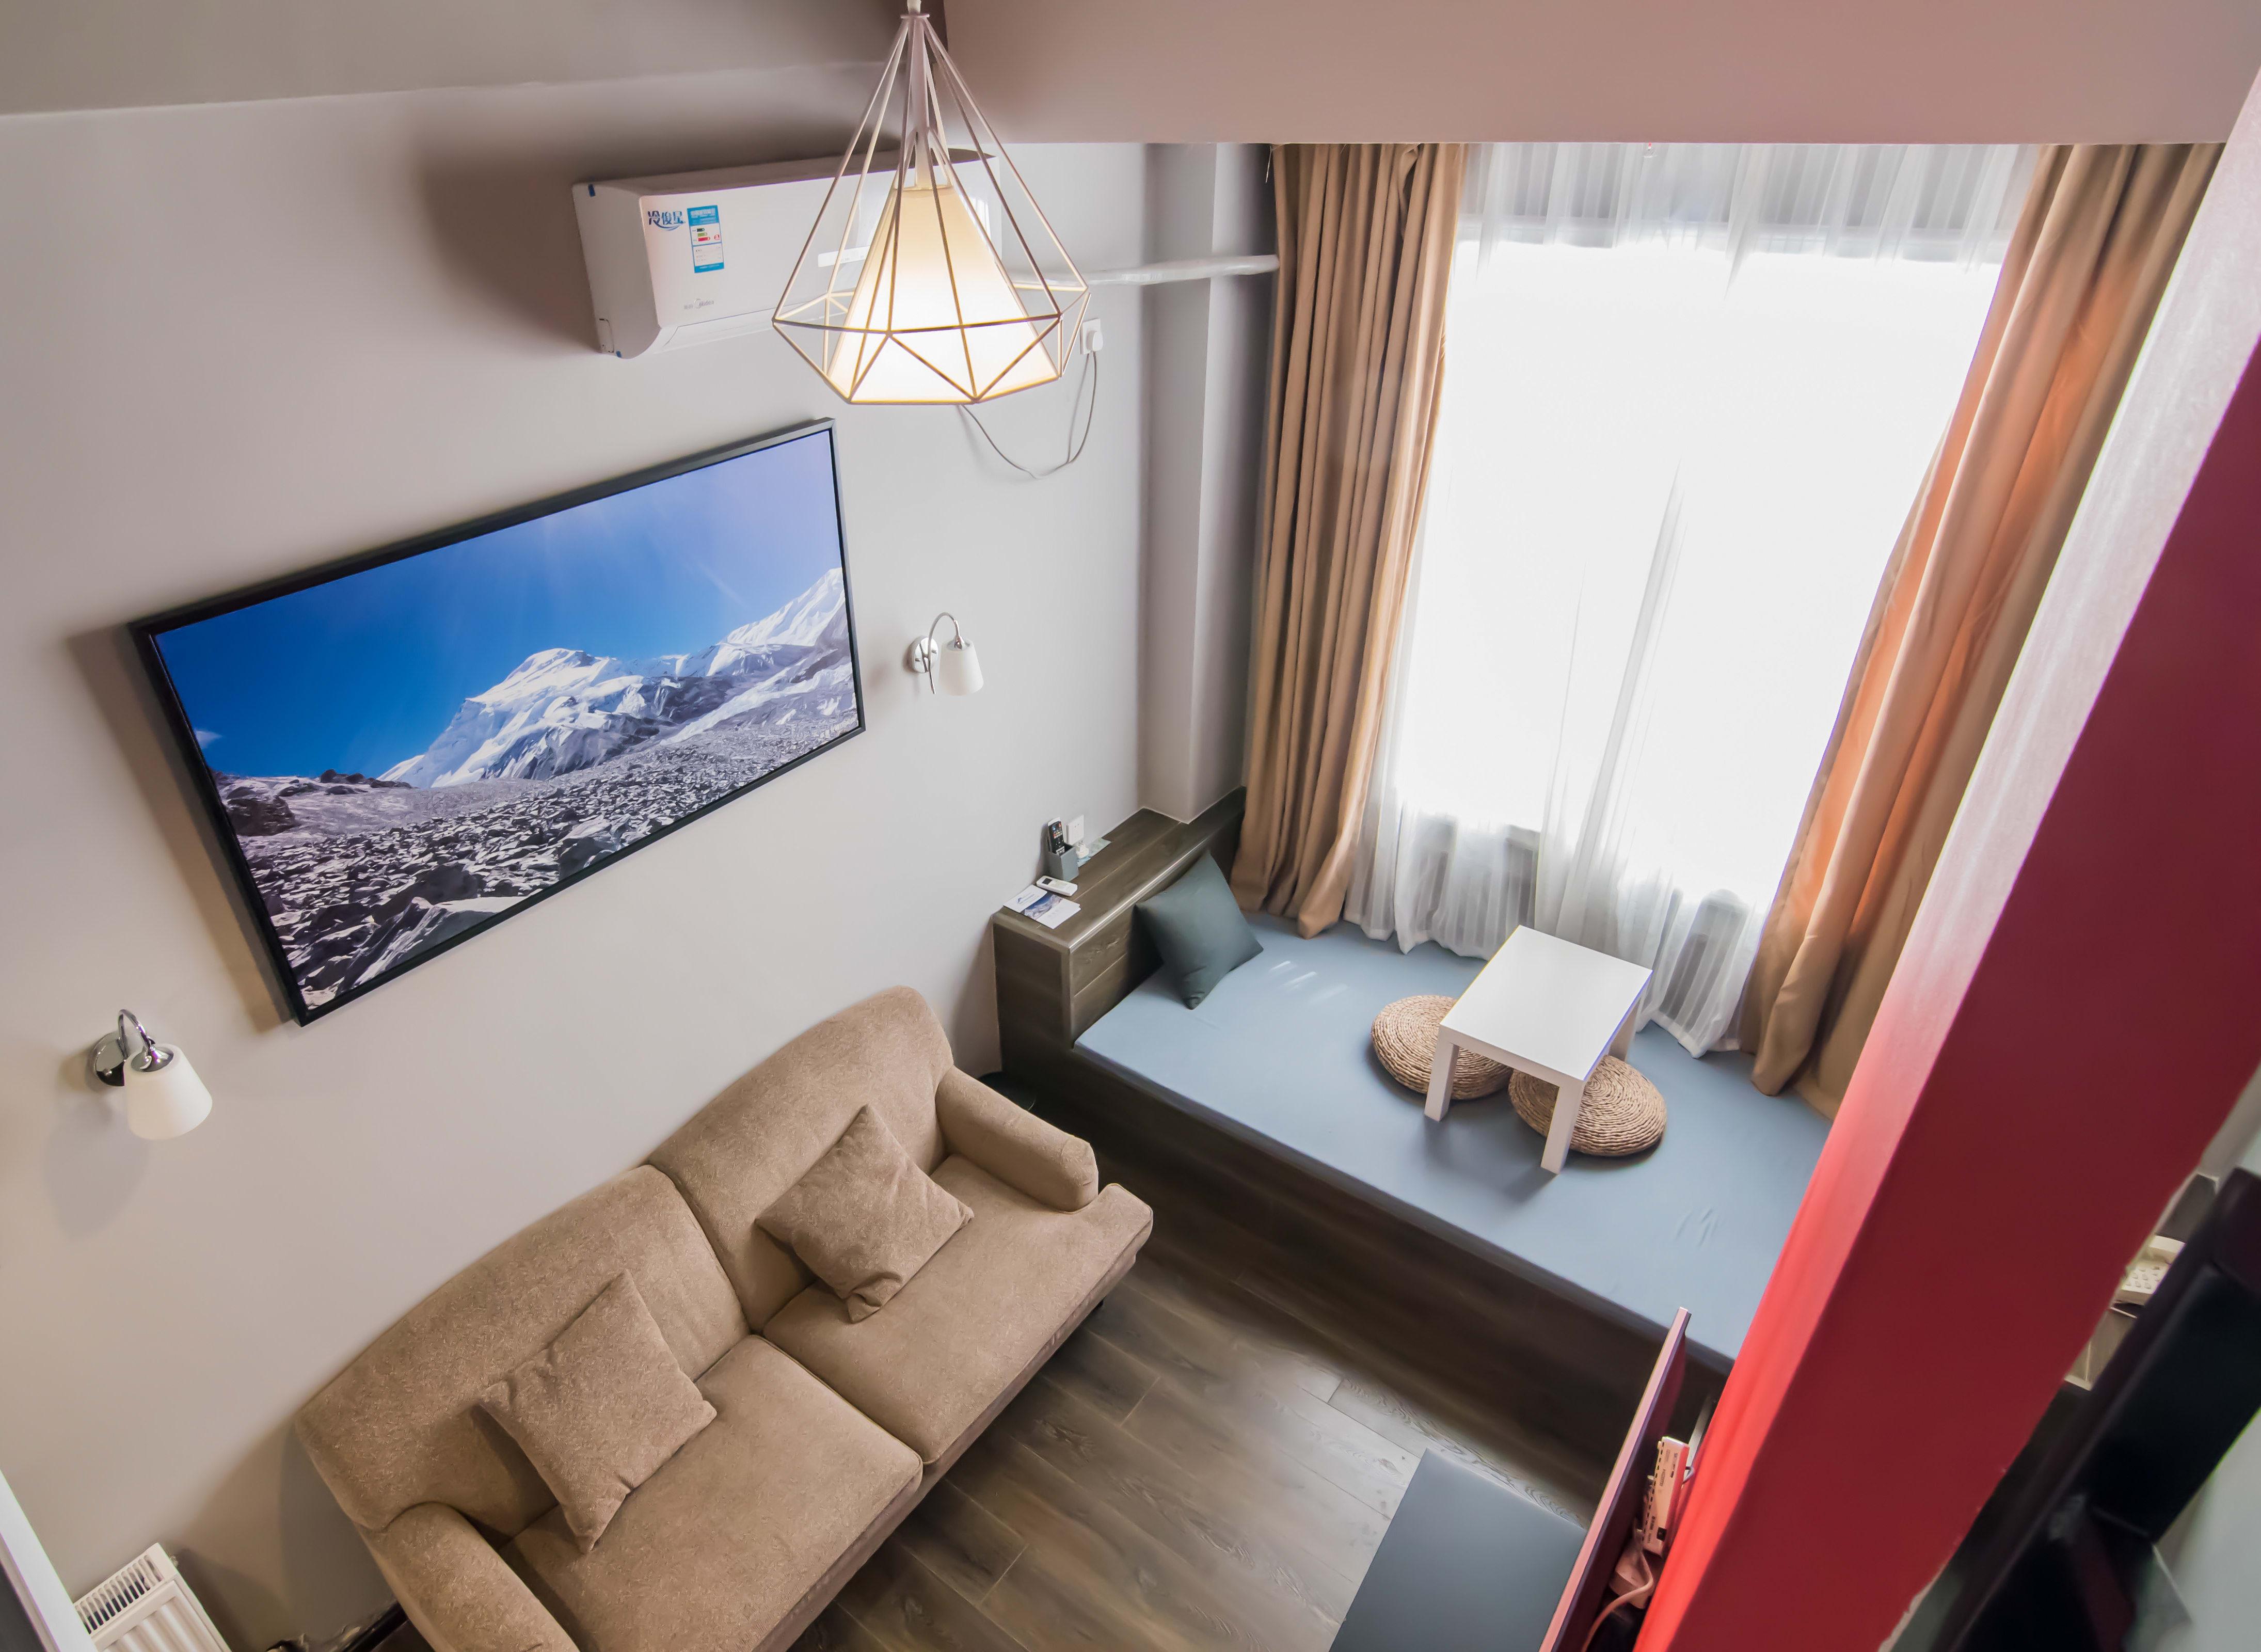 HOSTEL - Masherbrum Outdoor Travelling Hostel